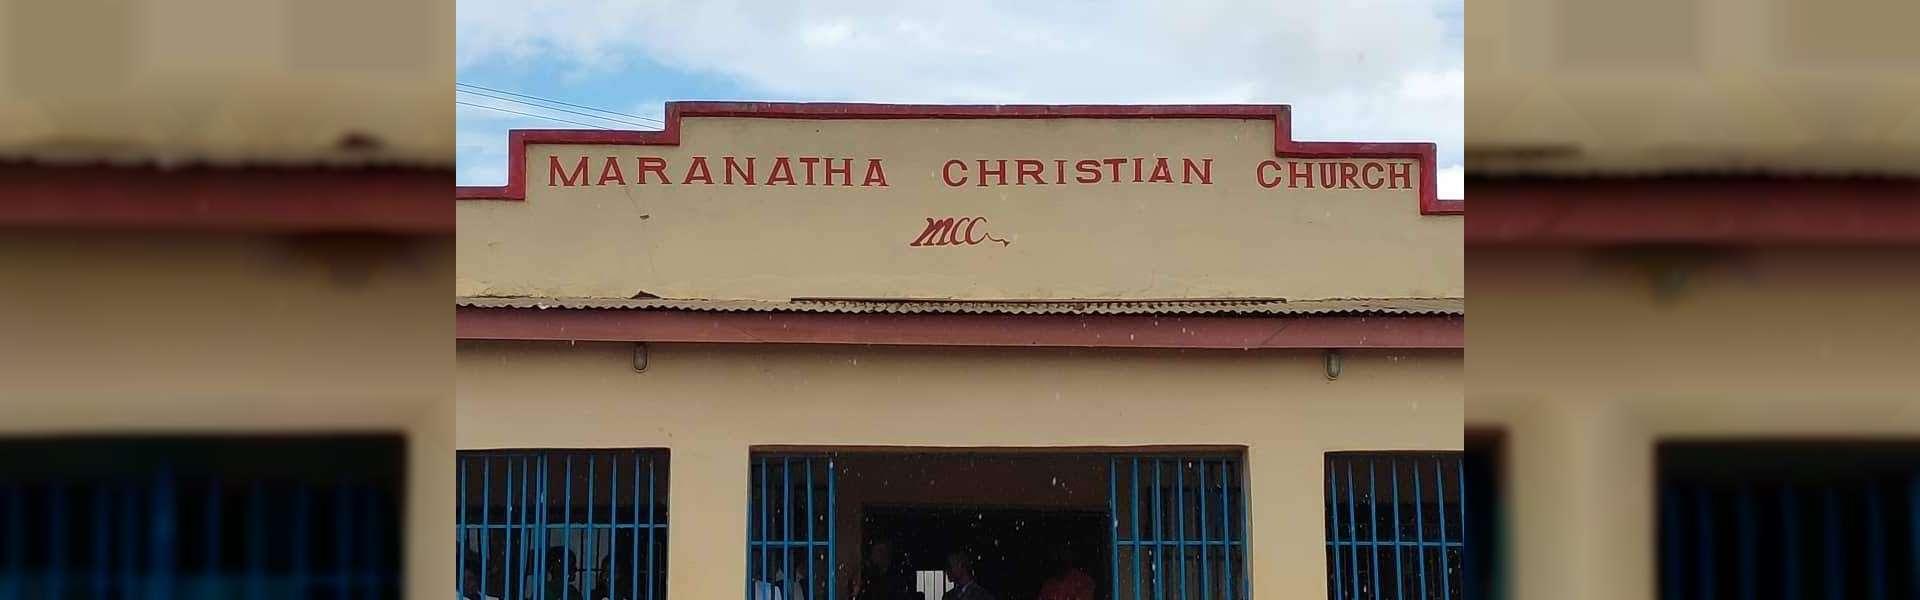 História da Igreja Cristã Maranata no Malawi, África